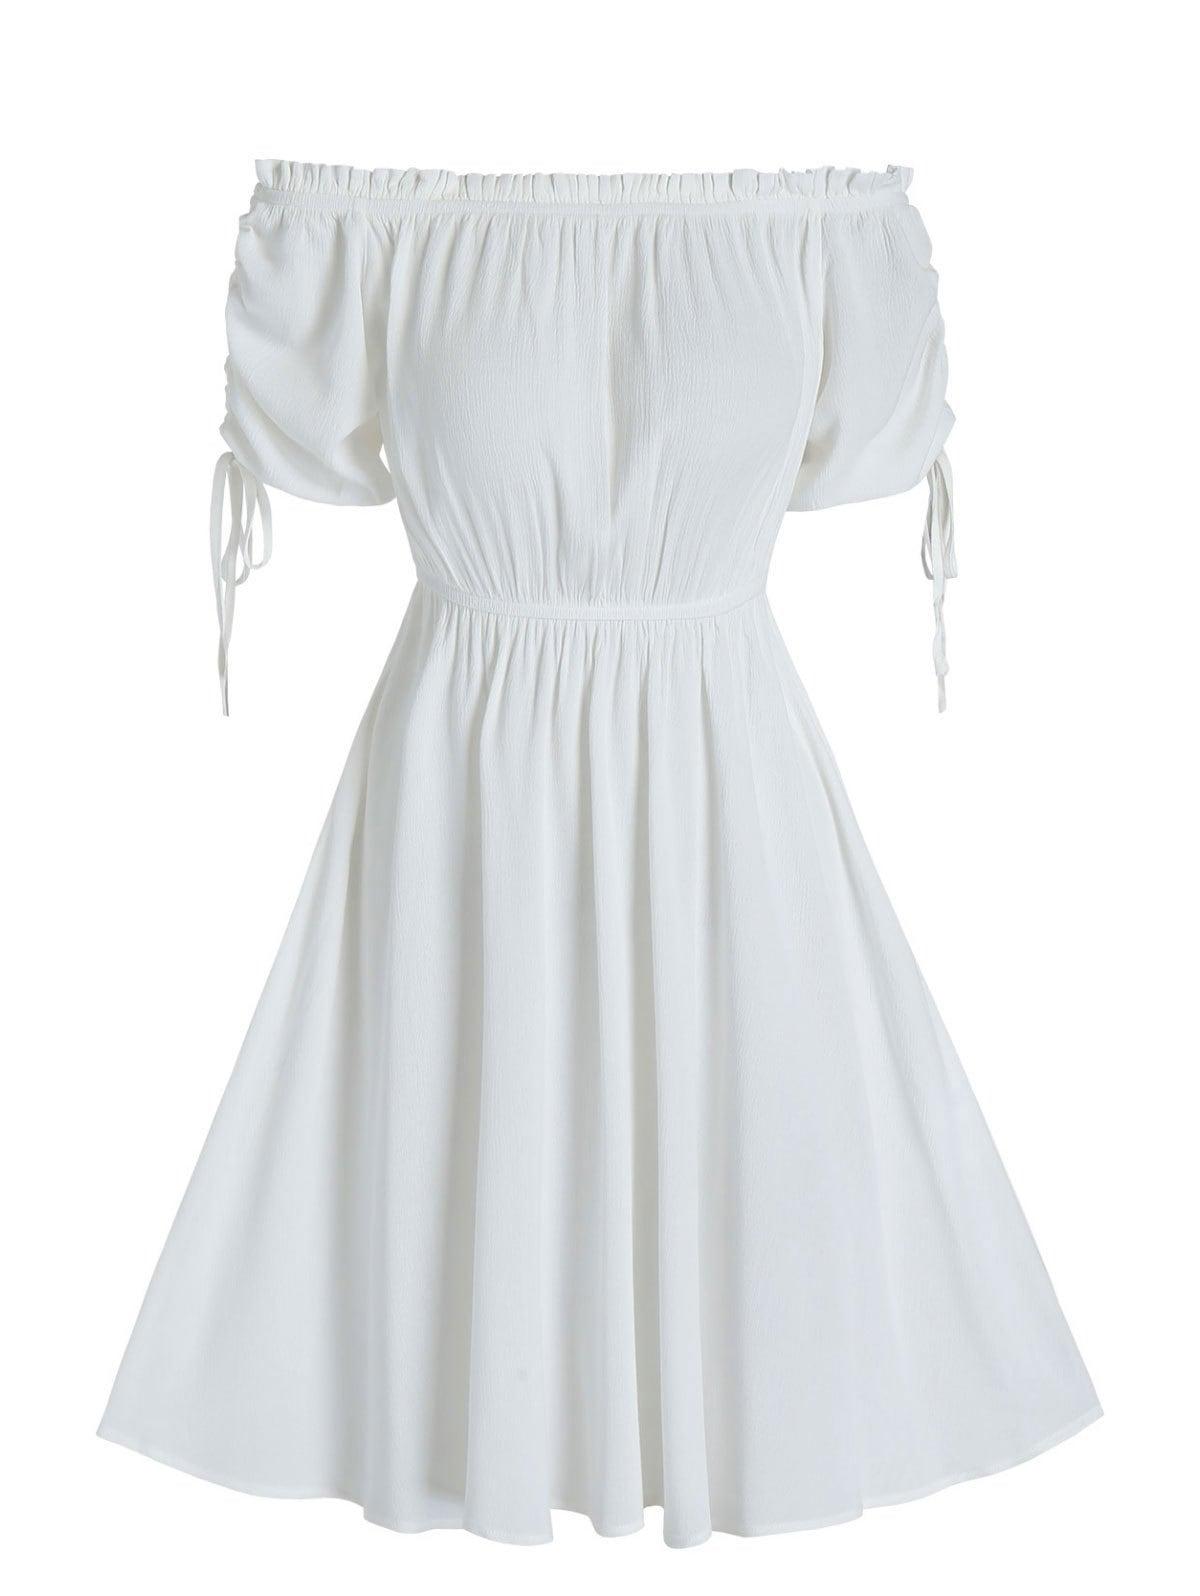 Off The Shoulder Drawstring Puff Sleeve Dress